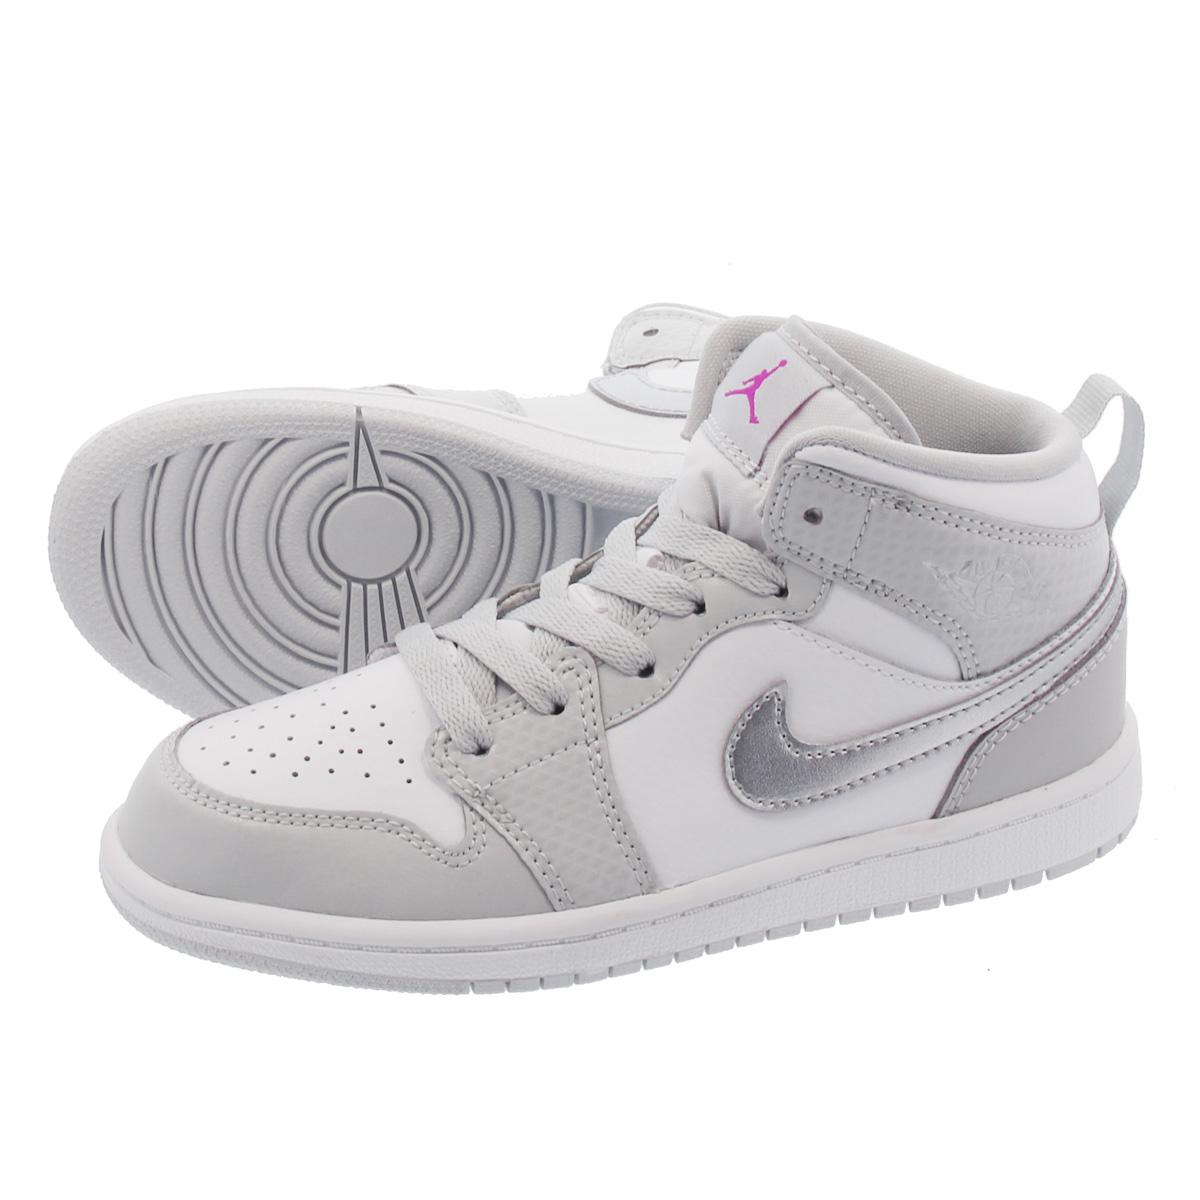 e22f10207cbd LOWTEX PLUS  NIKE AIR JORDAN 1 MID PS Nike Air Jordan 1 mid PS GREY  FOG DEADLY PINK METALLIC SILVER 640